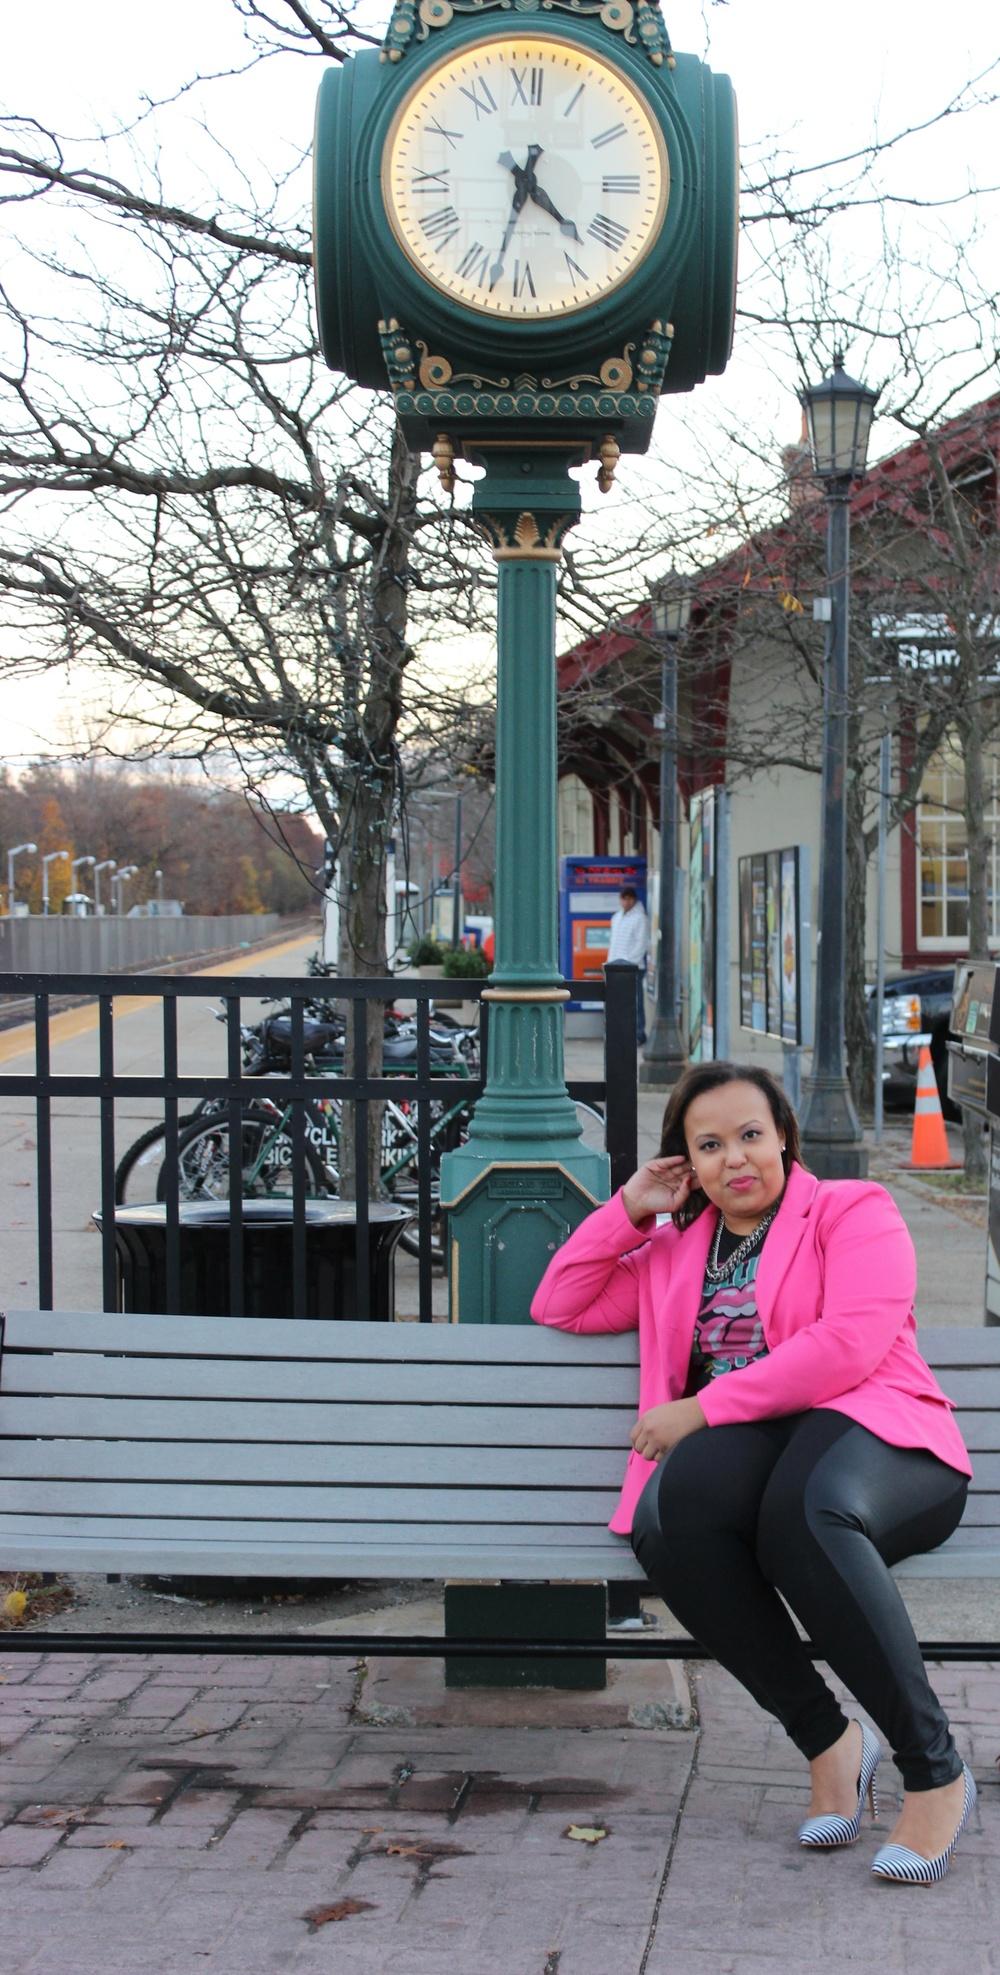 pink blazer sitting on bench.jpg